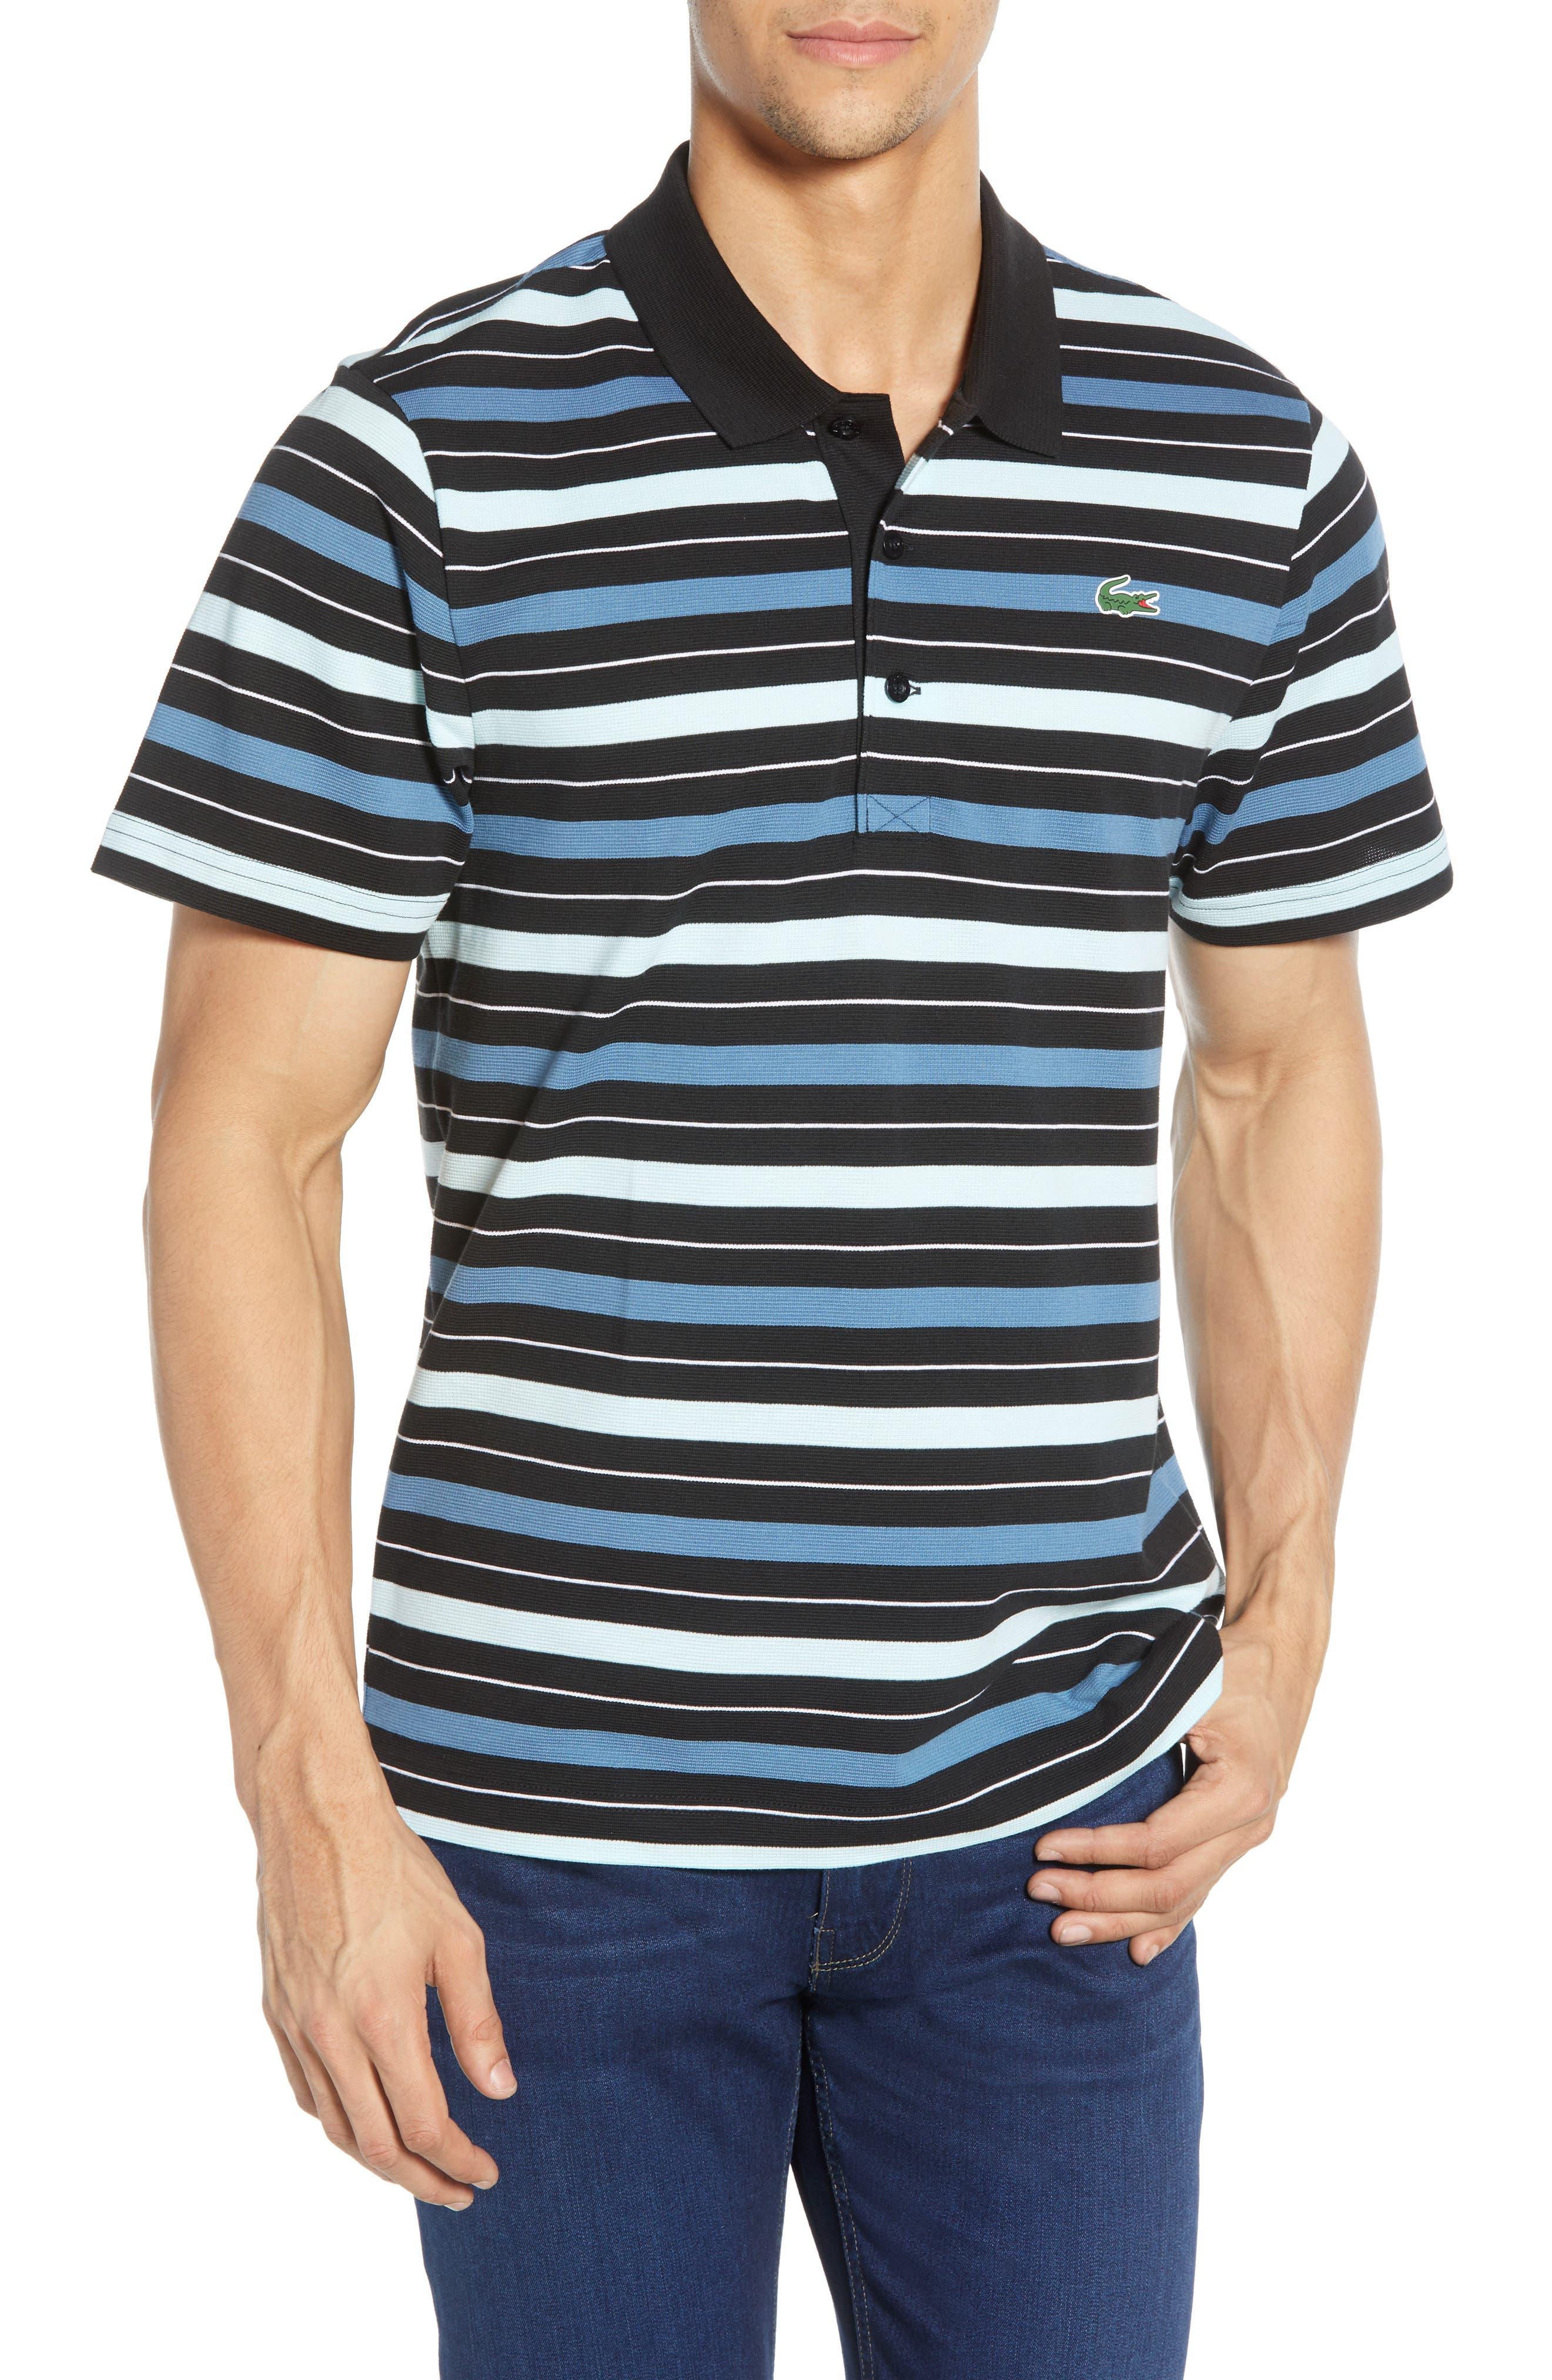 LACOSTE Super Light Stripe Piqué Polo, Main, color, BLACK/ AQUARIUM-WHITE-NEOTTIA